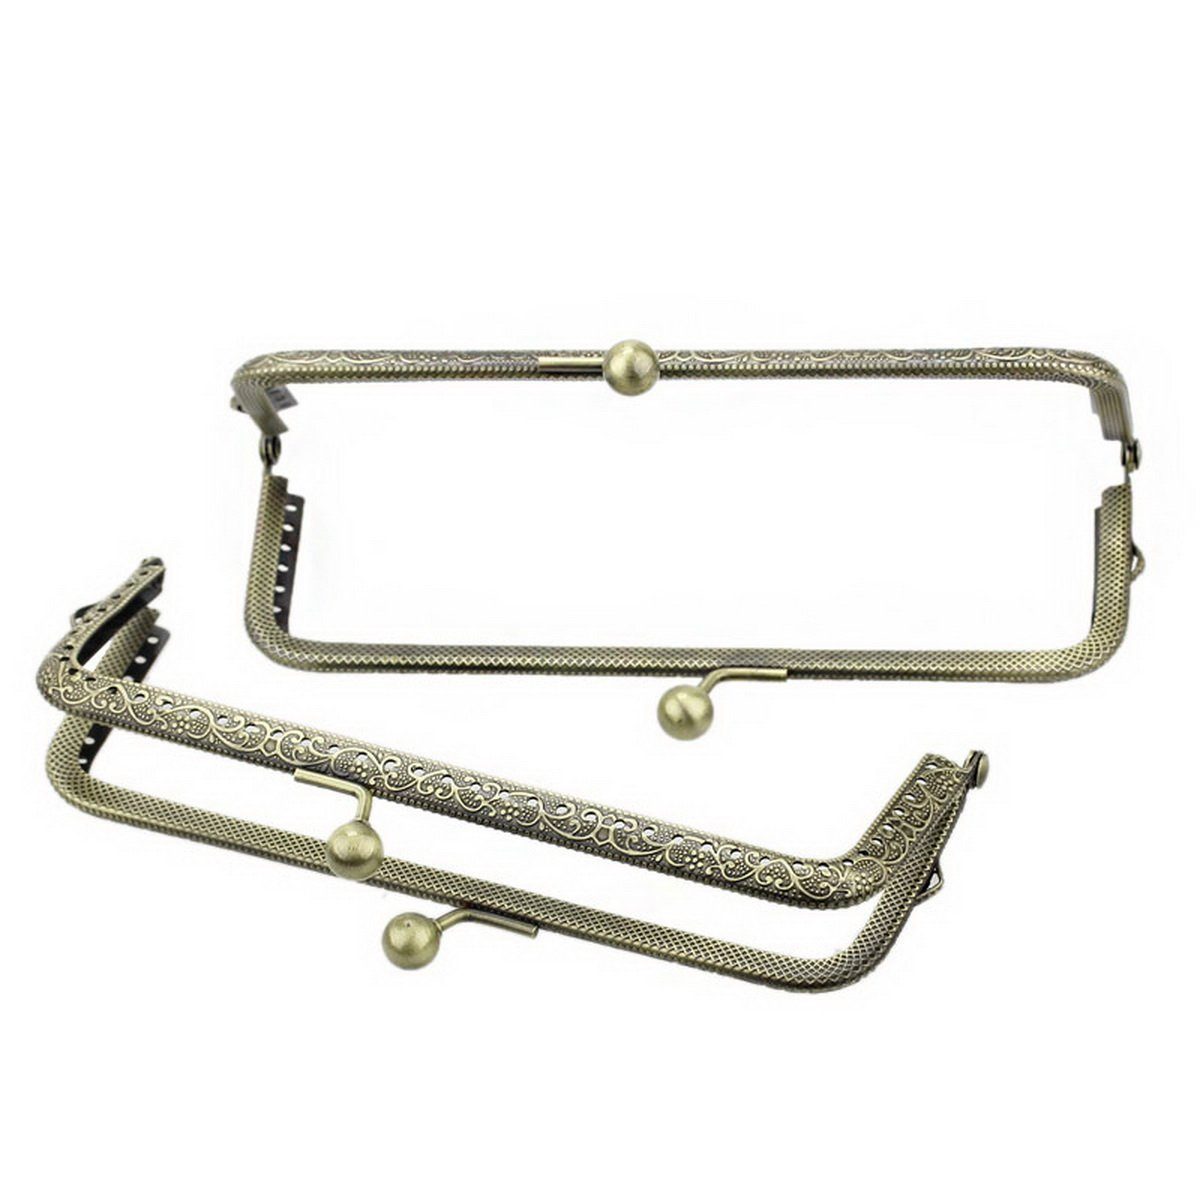 HOUSWEETY 3PCs Metal Purse Bag Frame Kiss Clasp Lock Bronze Tone 15.5cmx7cm